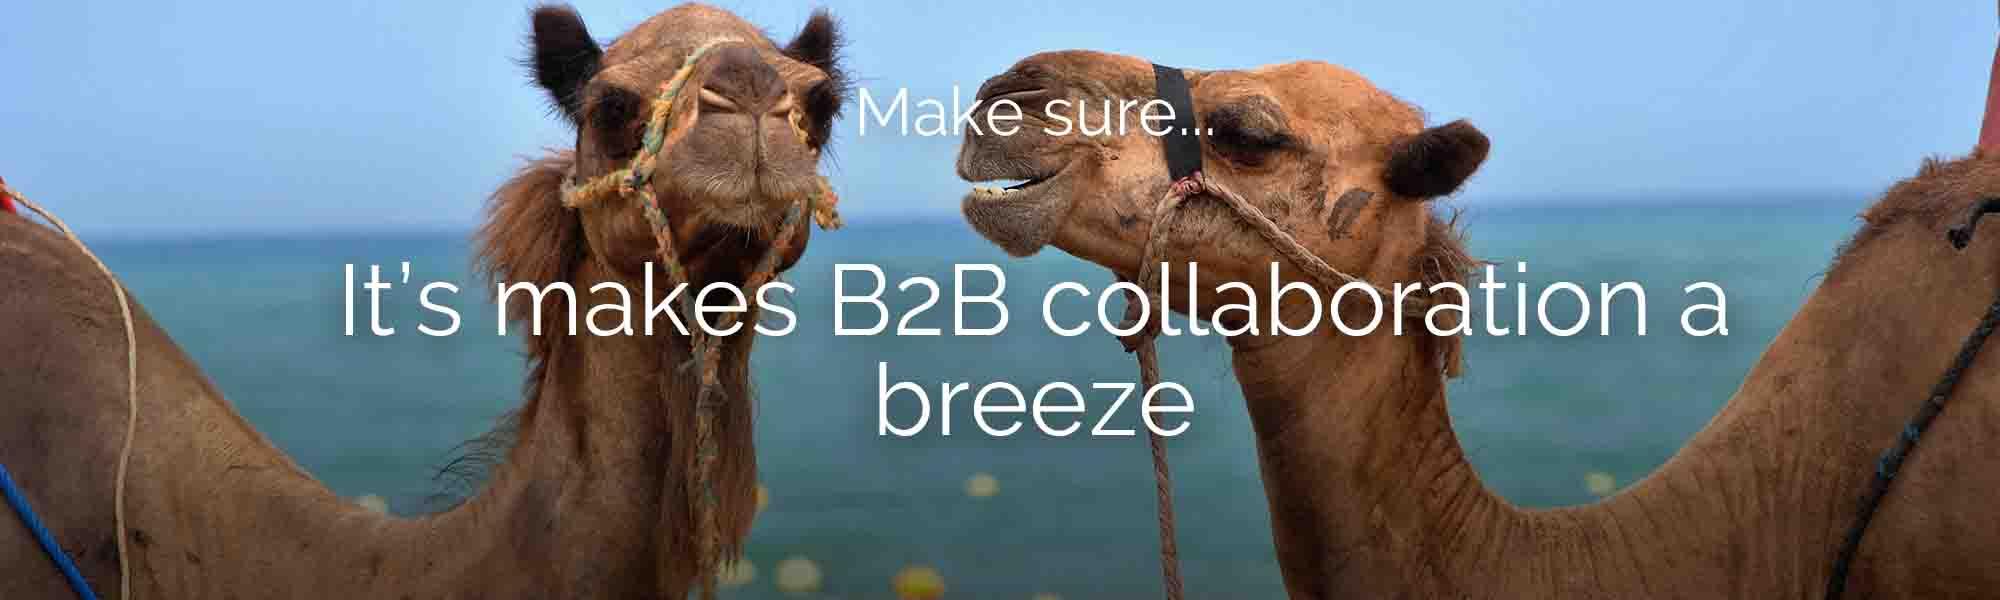 b2b tour operator software